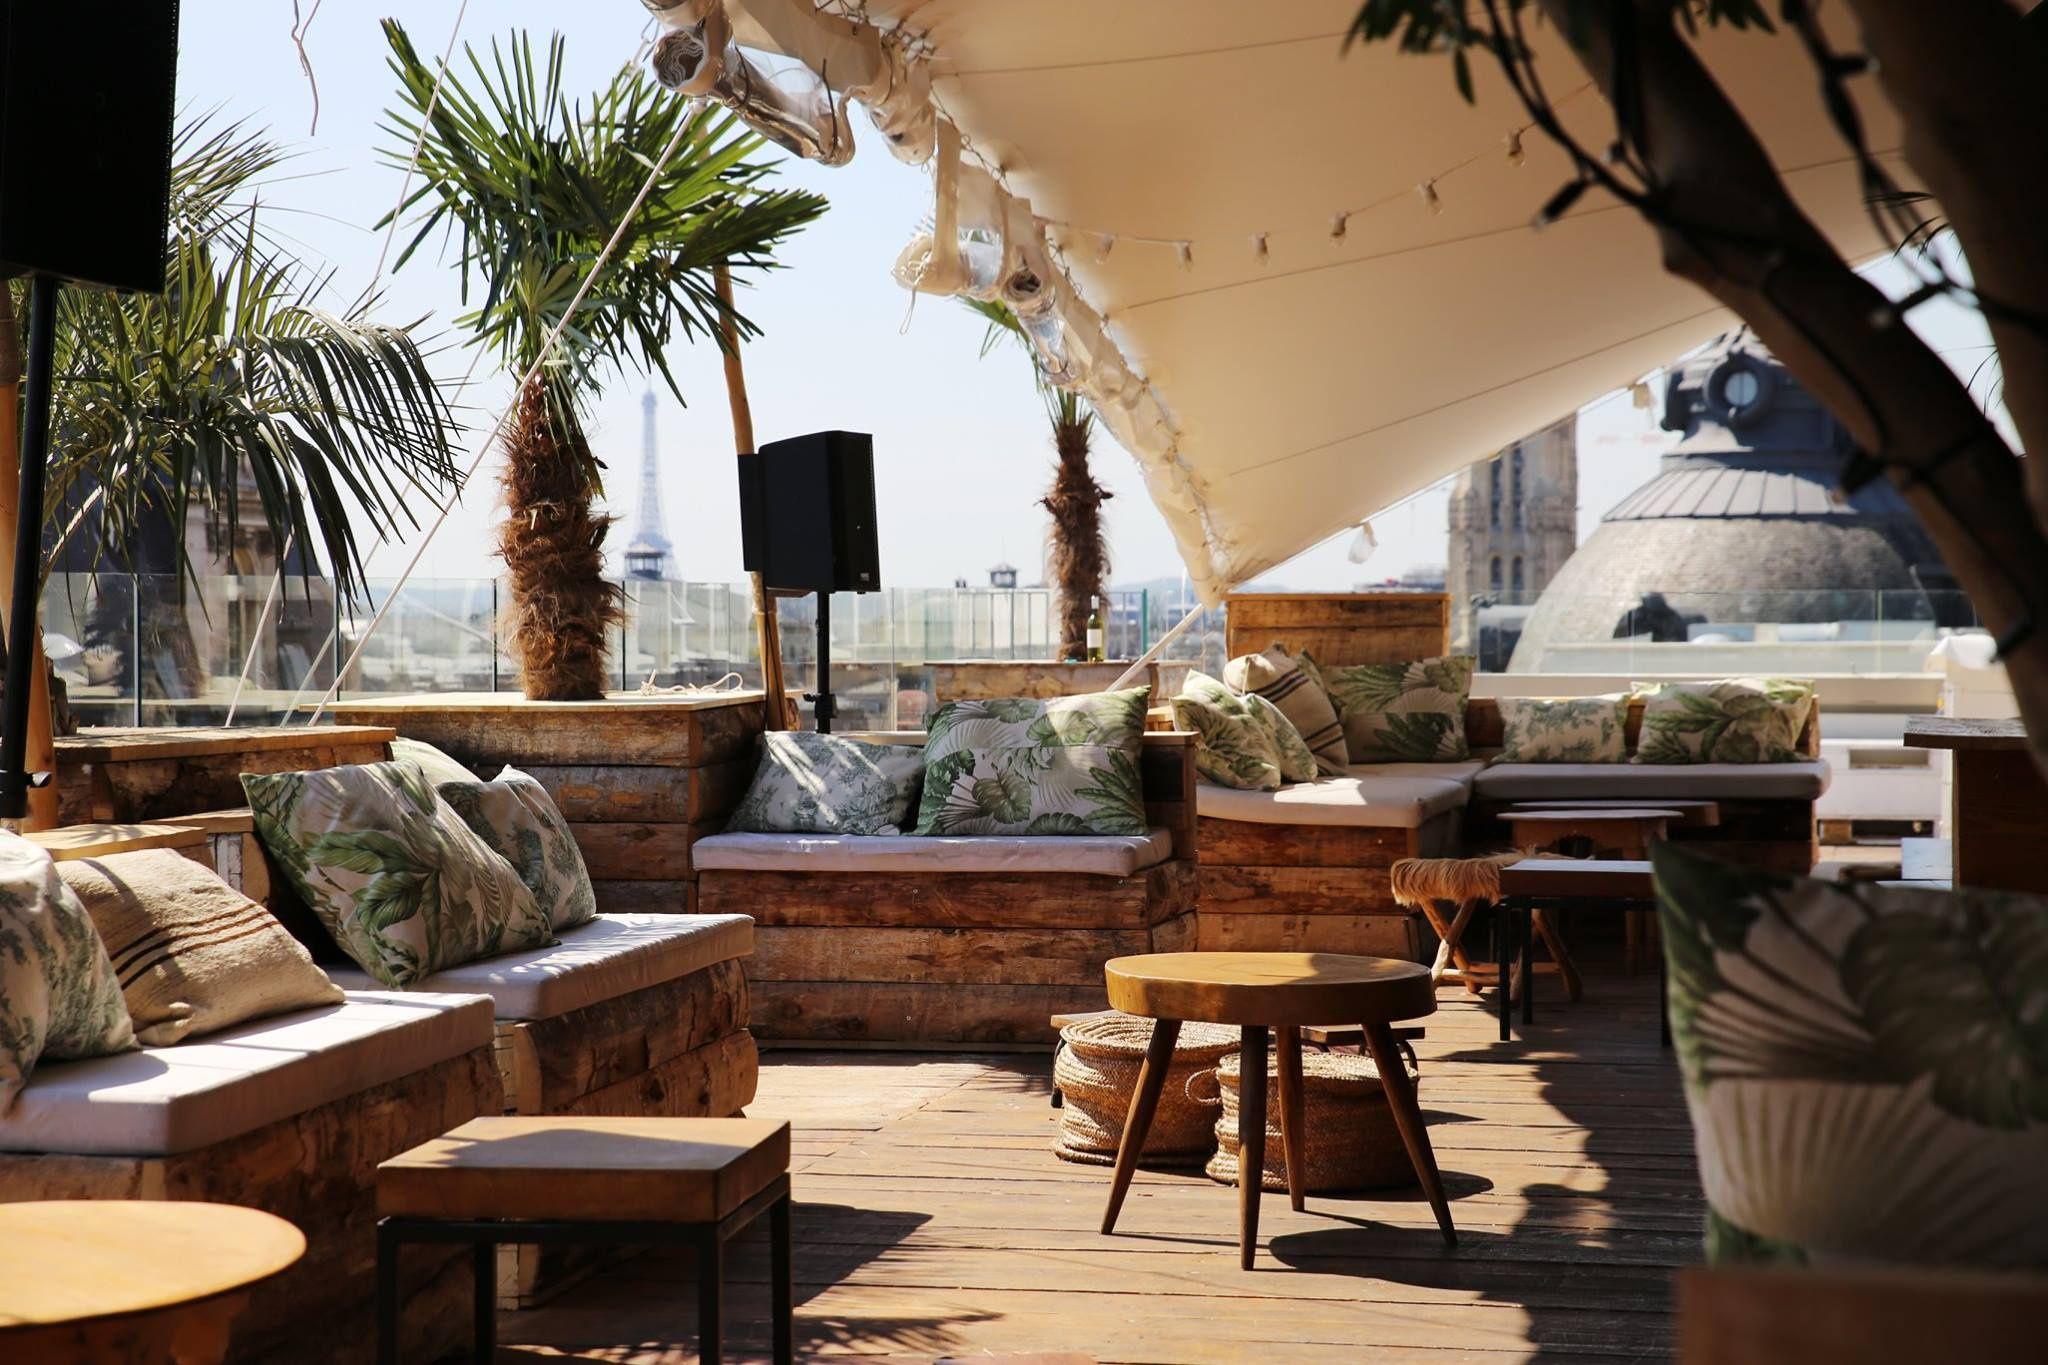 Rooftop Terraces In Paris - Terraces&Roof Flats - Pinterest -